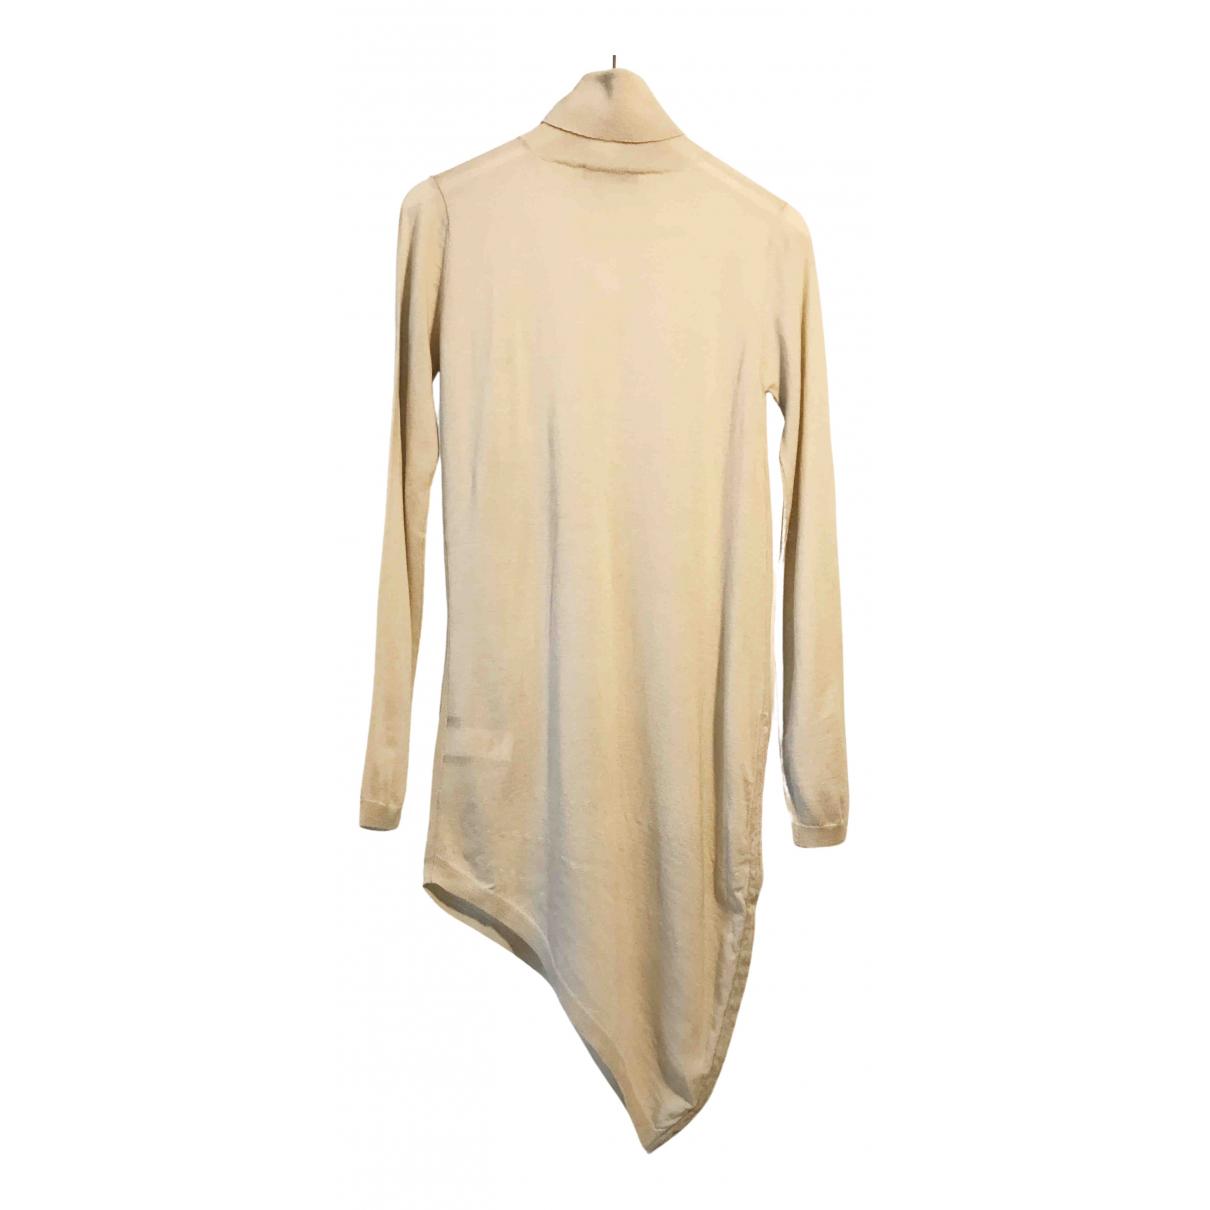 Jil Sander - Pull   pour femme en laine - beige